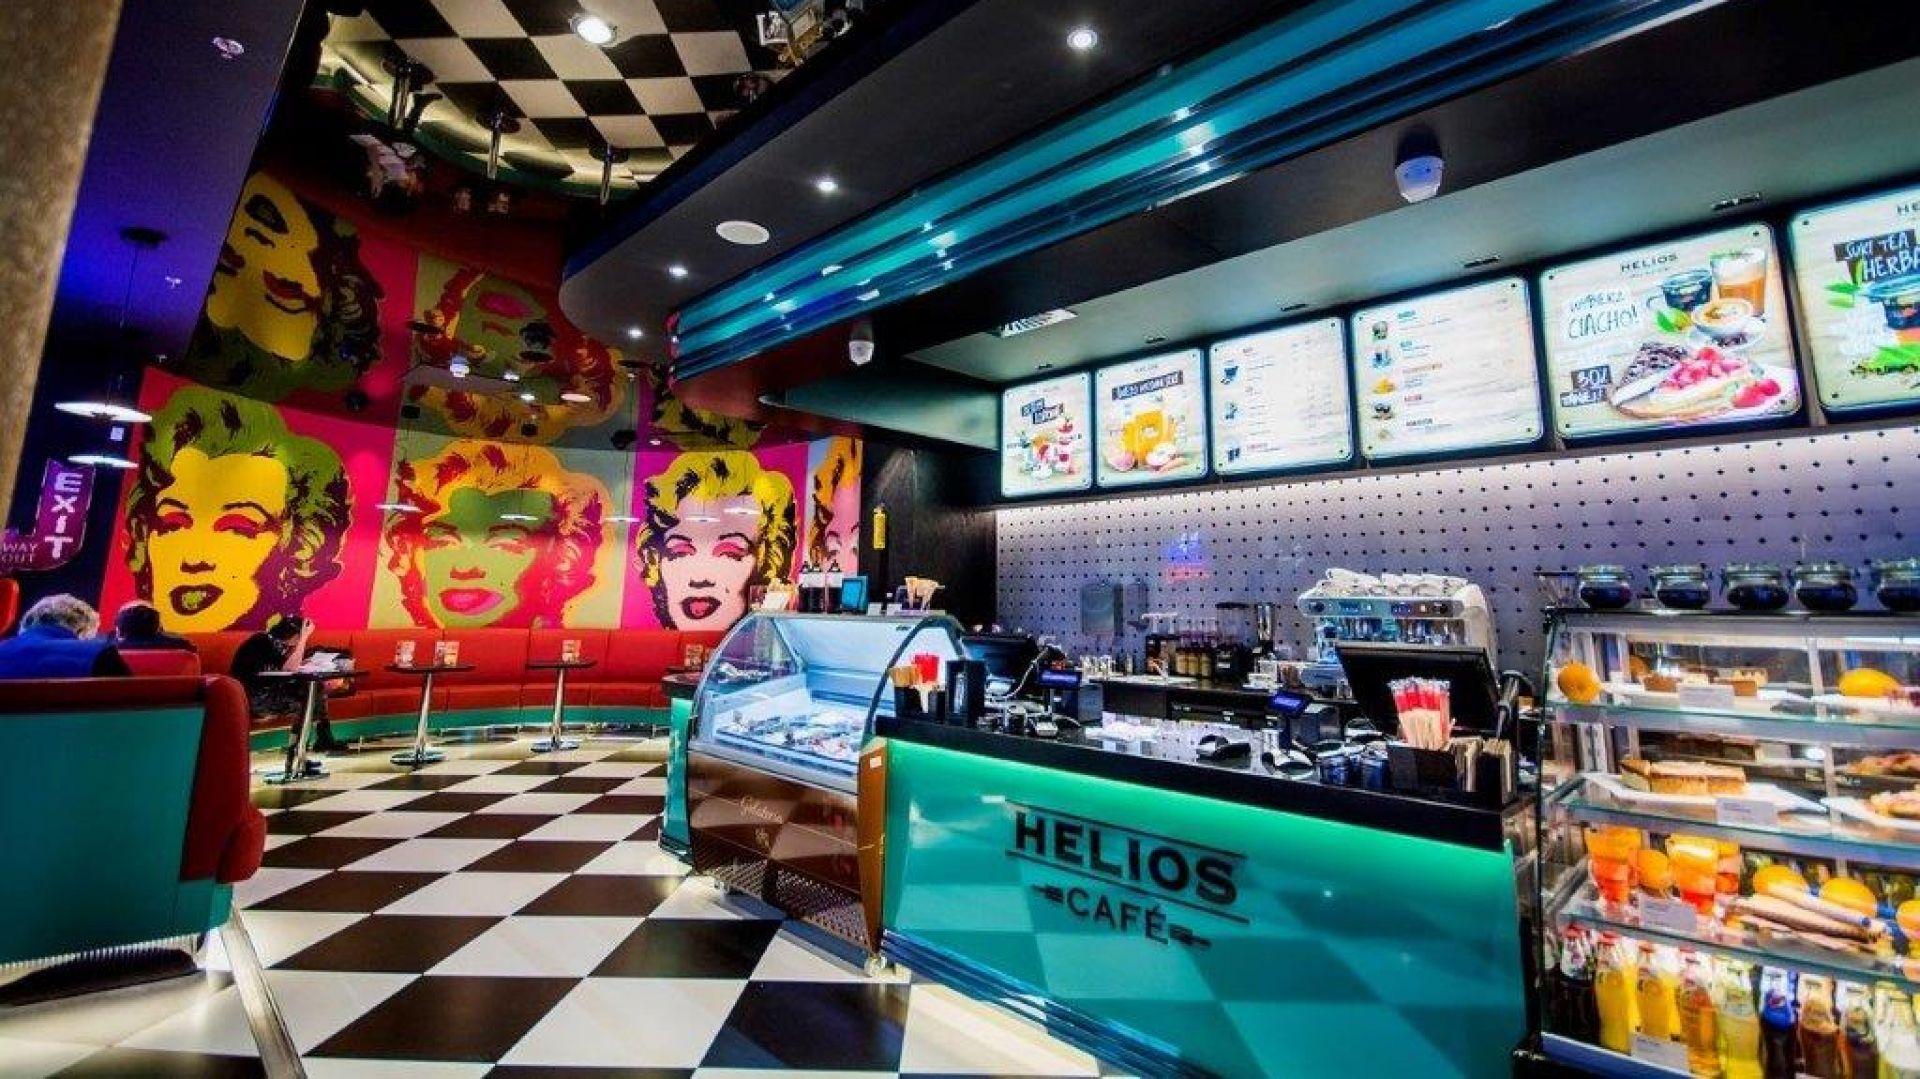 Kino Helios Blue City proj. Gierłtowski&Partnerzy Extract Design (16).jpg